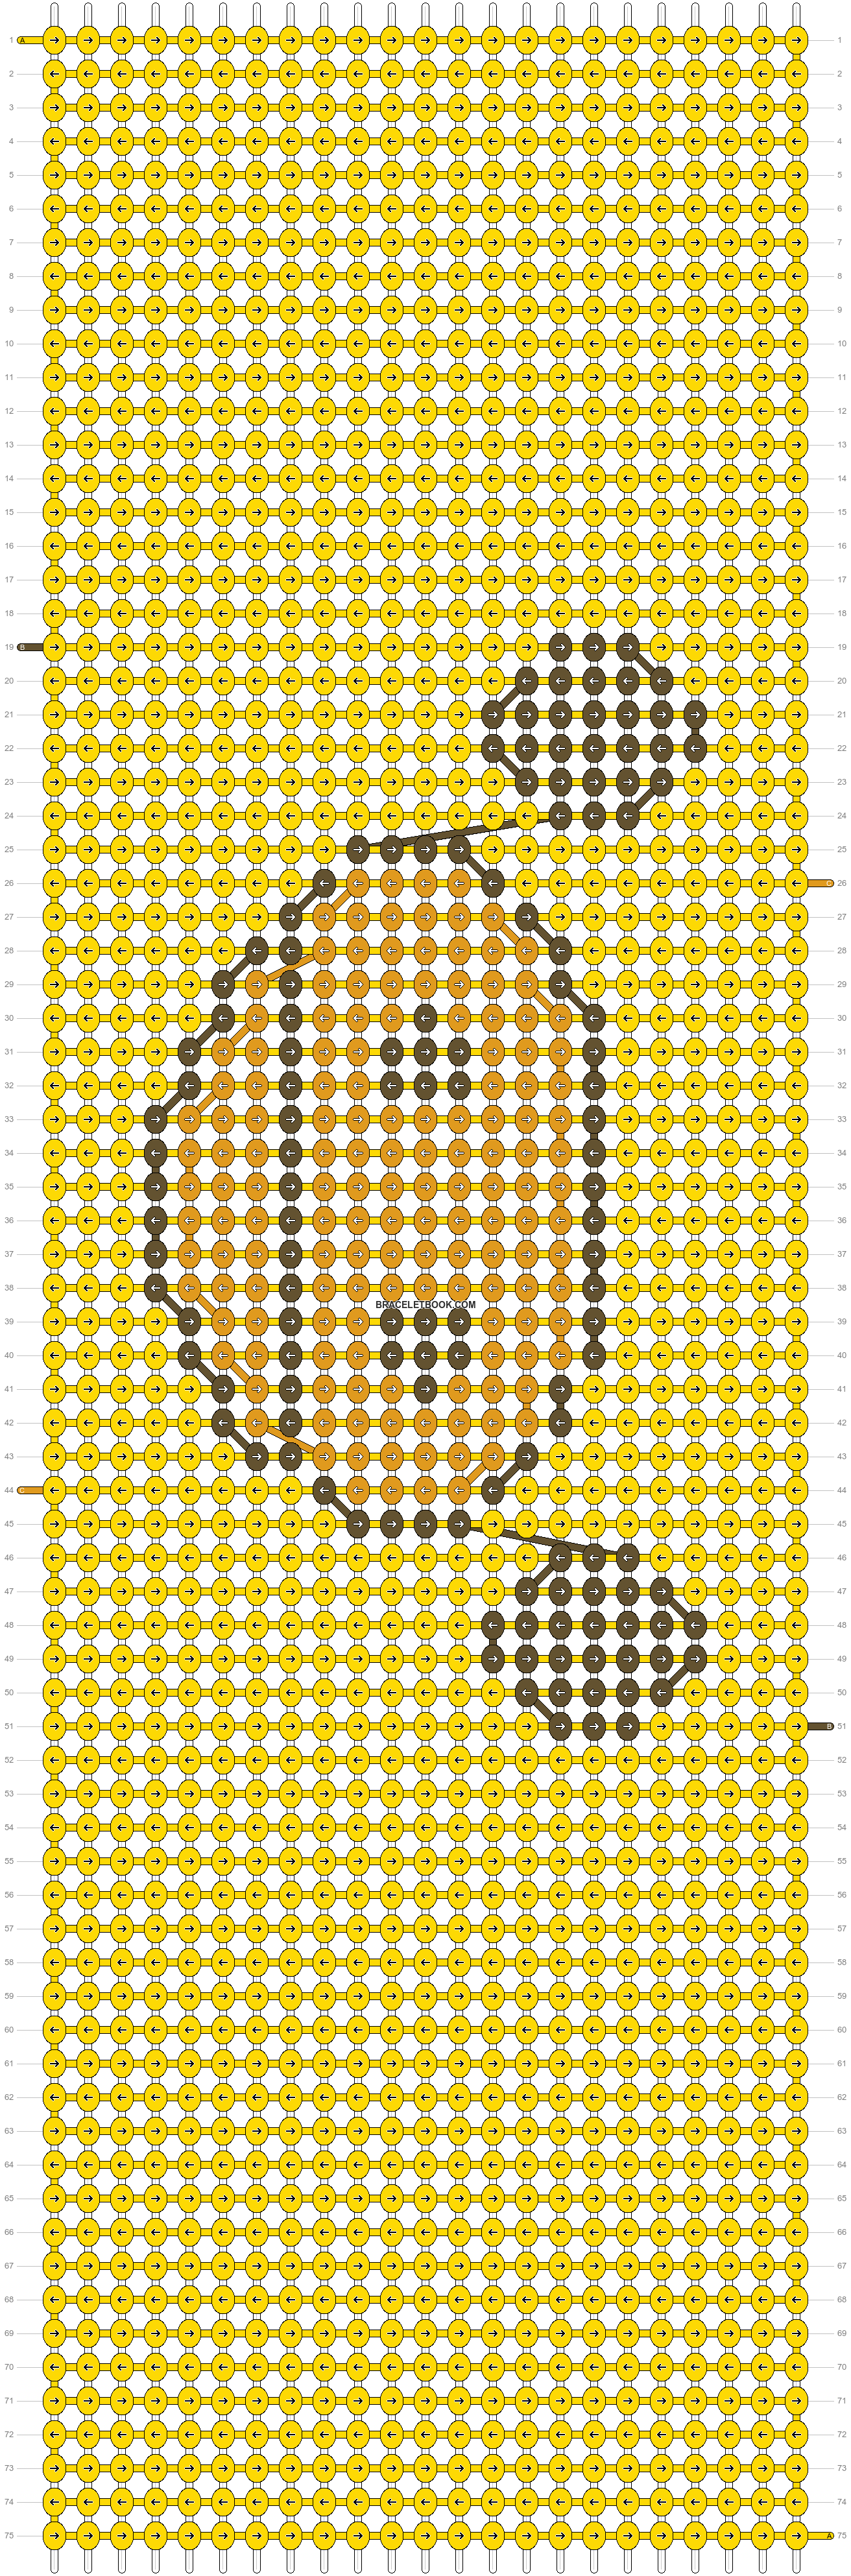 Alpha pattern #8594 pattern